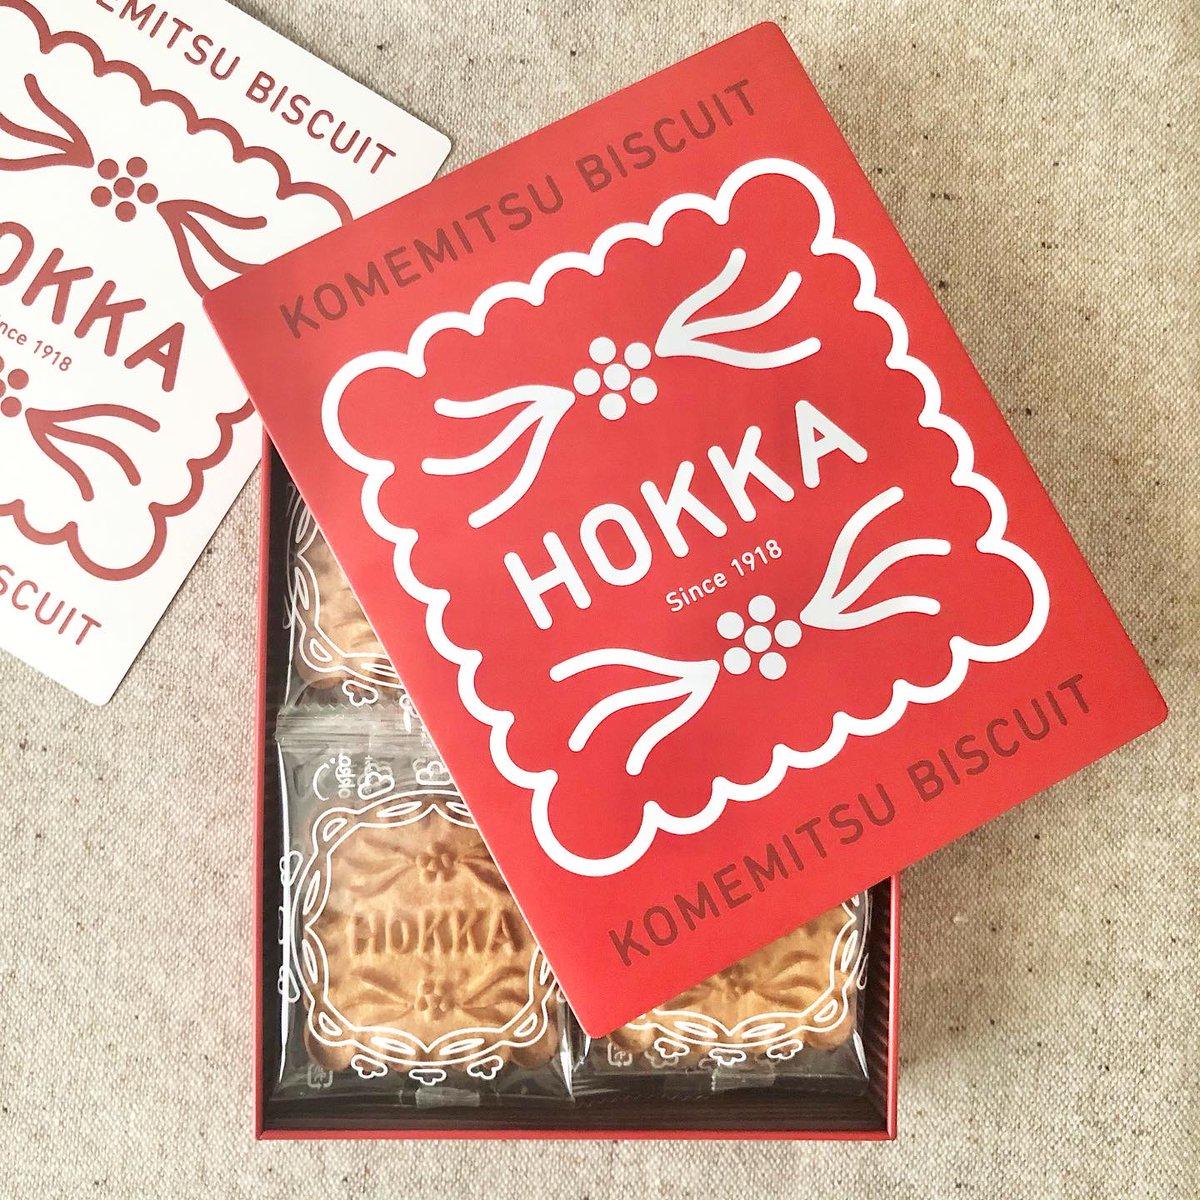 "test ツイッターメディア - 100年の歴史を持つ金沢のビスケットメーカー 「#hokka」こと北陸製菓の「#米蜜ビスケット」。金沢の老舗あめ屋「俵屋」の""じろあめ""(米飴)、てんさい糖、玄米甘酒からくる優しい甘さと、ザクザクと香ばしい食感は、どこか懐かしさを感じる味です。真っ赤な可愛らしい缶に入っています。 https://t.co/ImVyBZudwE"